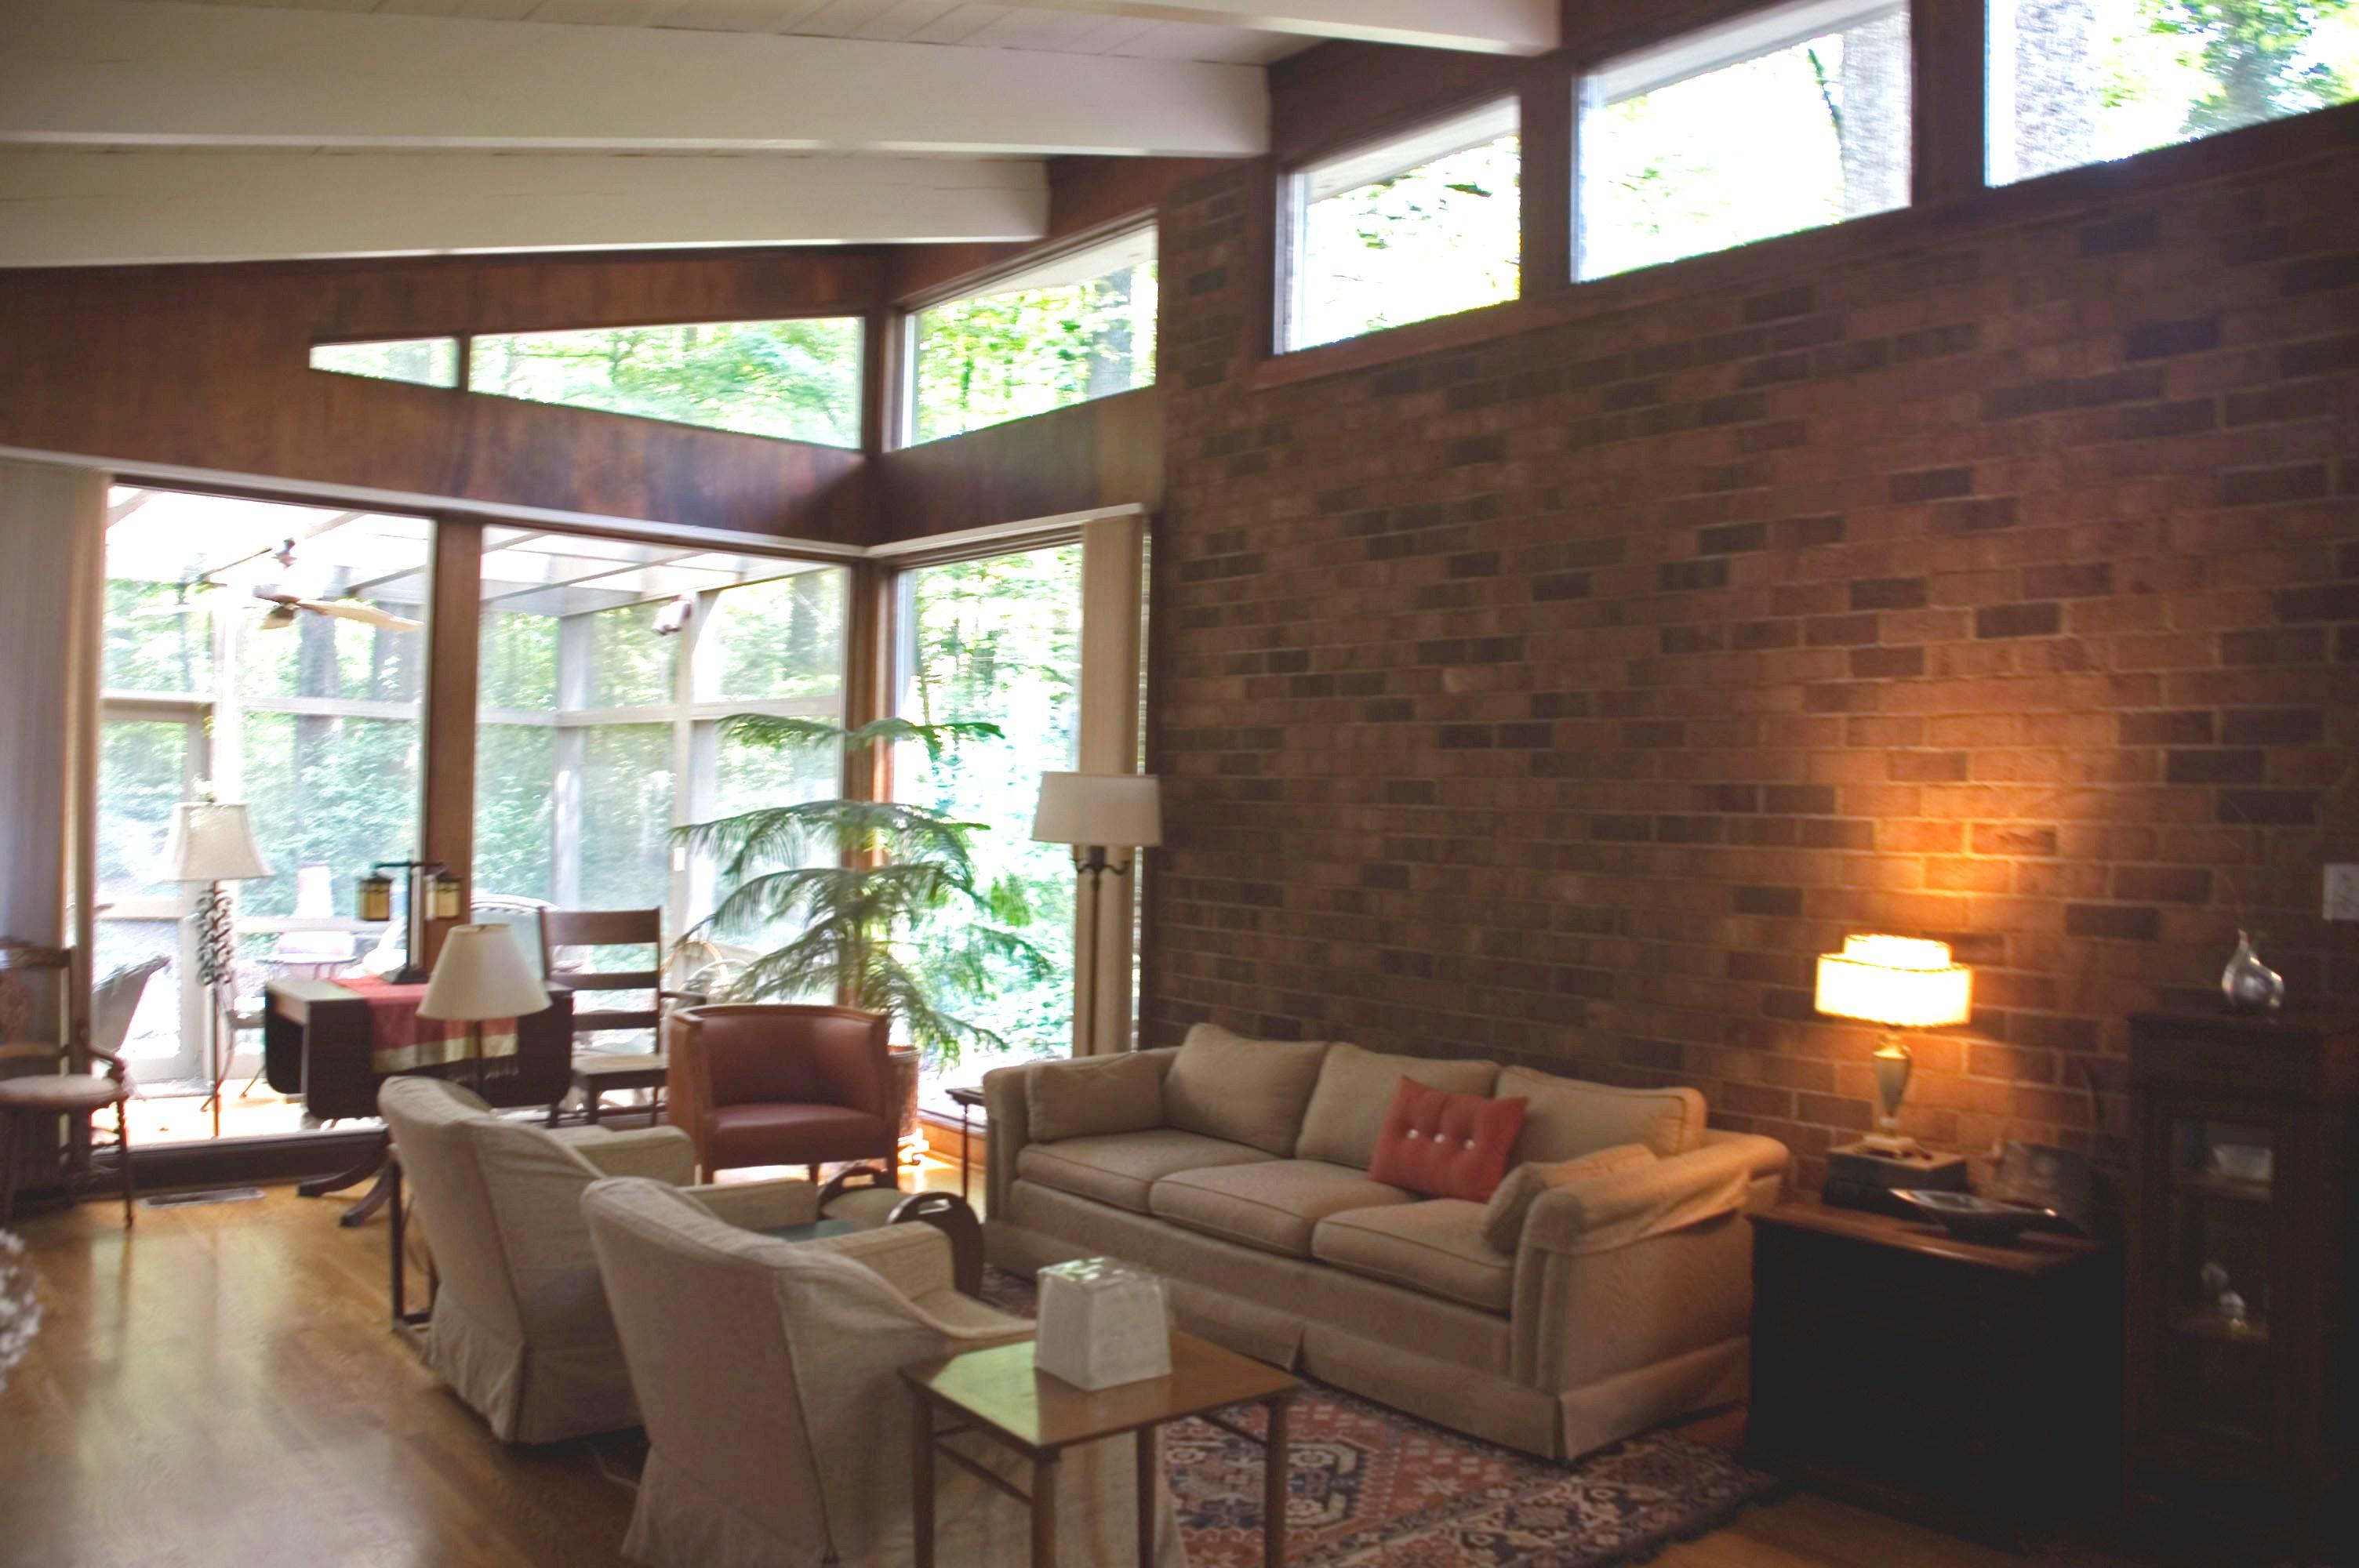 court interiors greensboro from house hex matzinger interior nc design designers vivid downtown